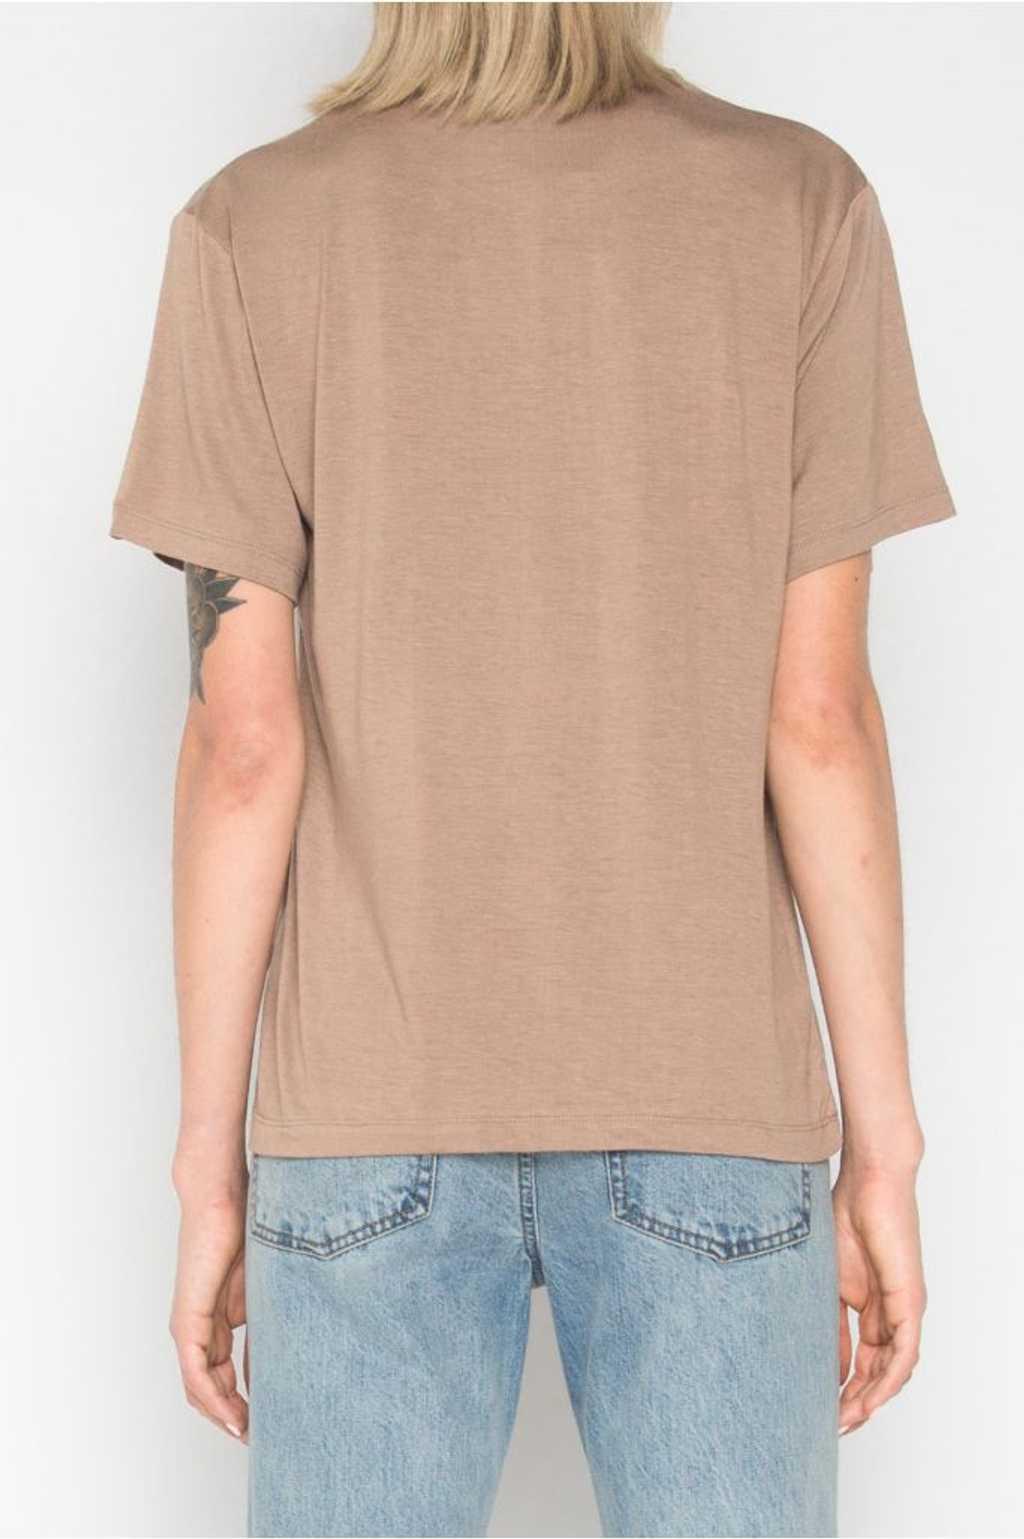 TShirt H240 Brown 2